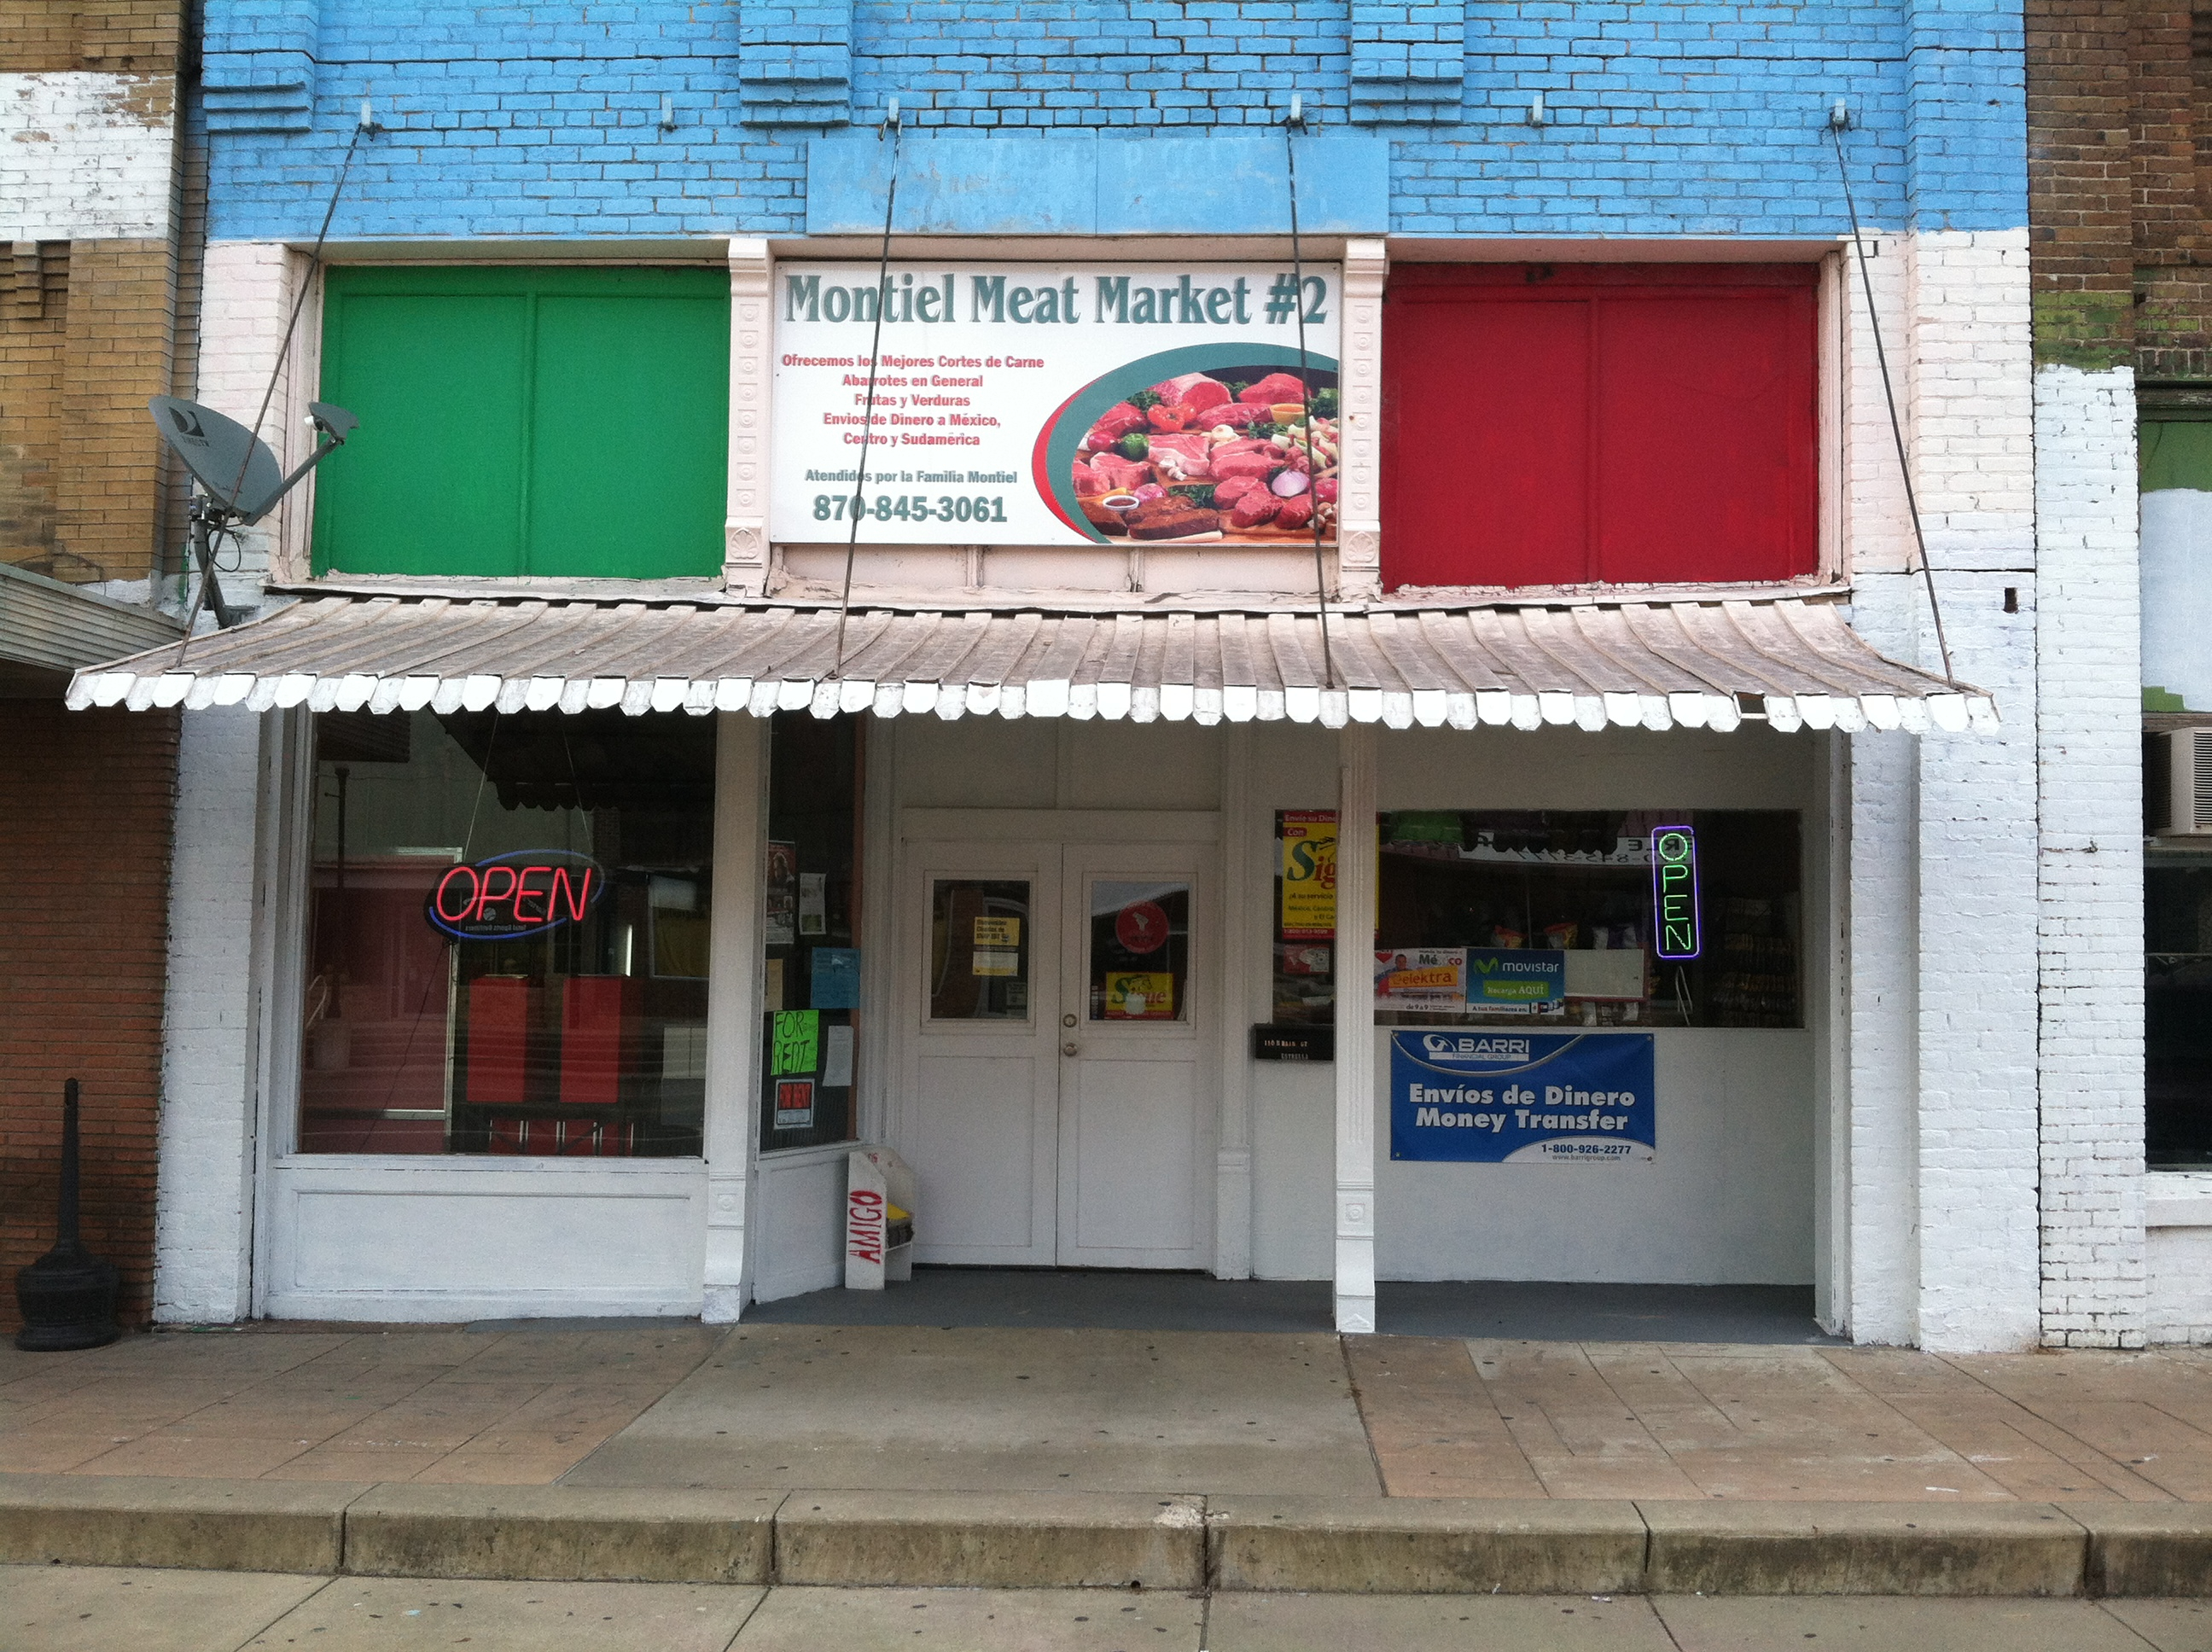 Meat Market Montiel 2 110 N Main St Nashville Ar 71852 Closed